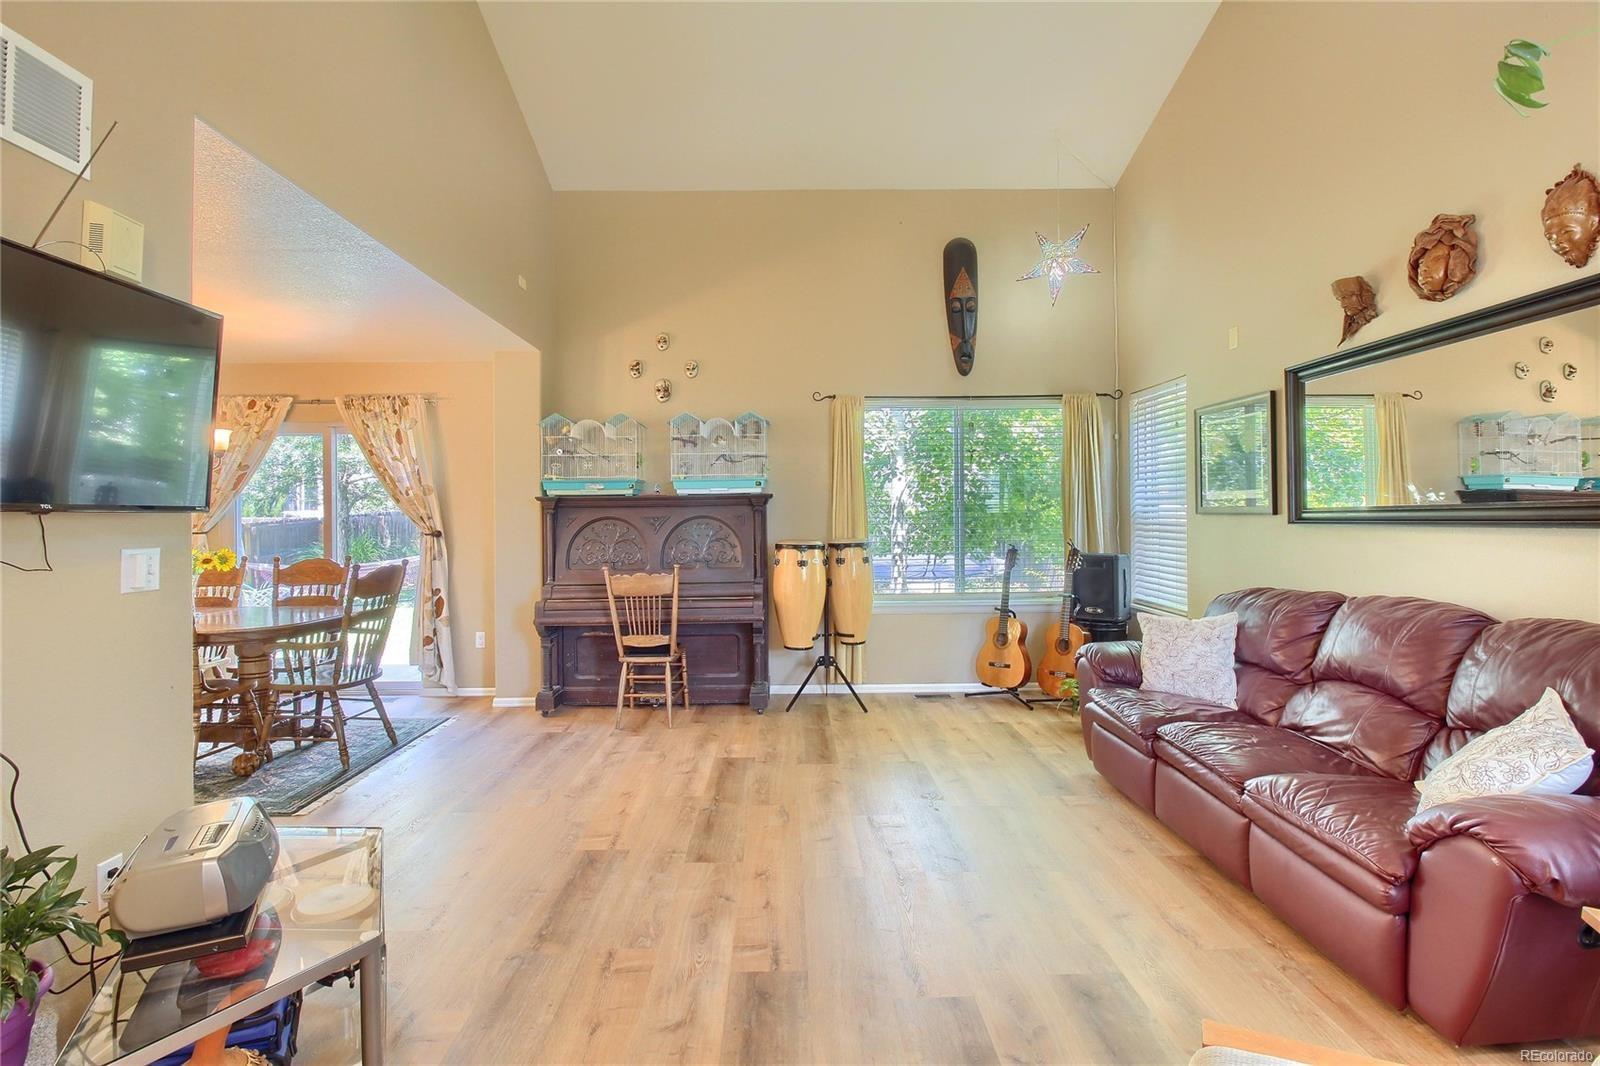 MLS# 3607545 - 3 - 5604 Mount Sanitas Avenue, Longmont, CO 80503